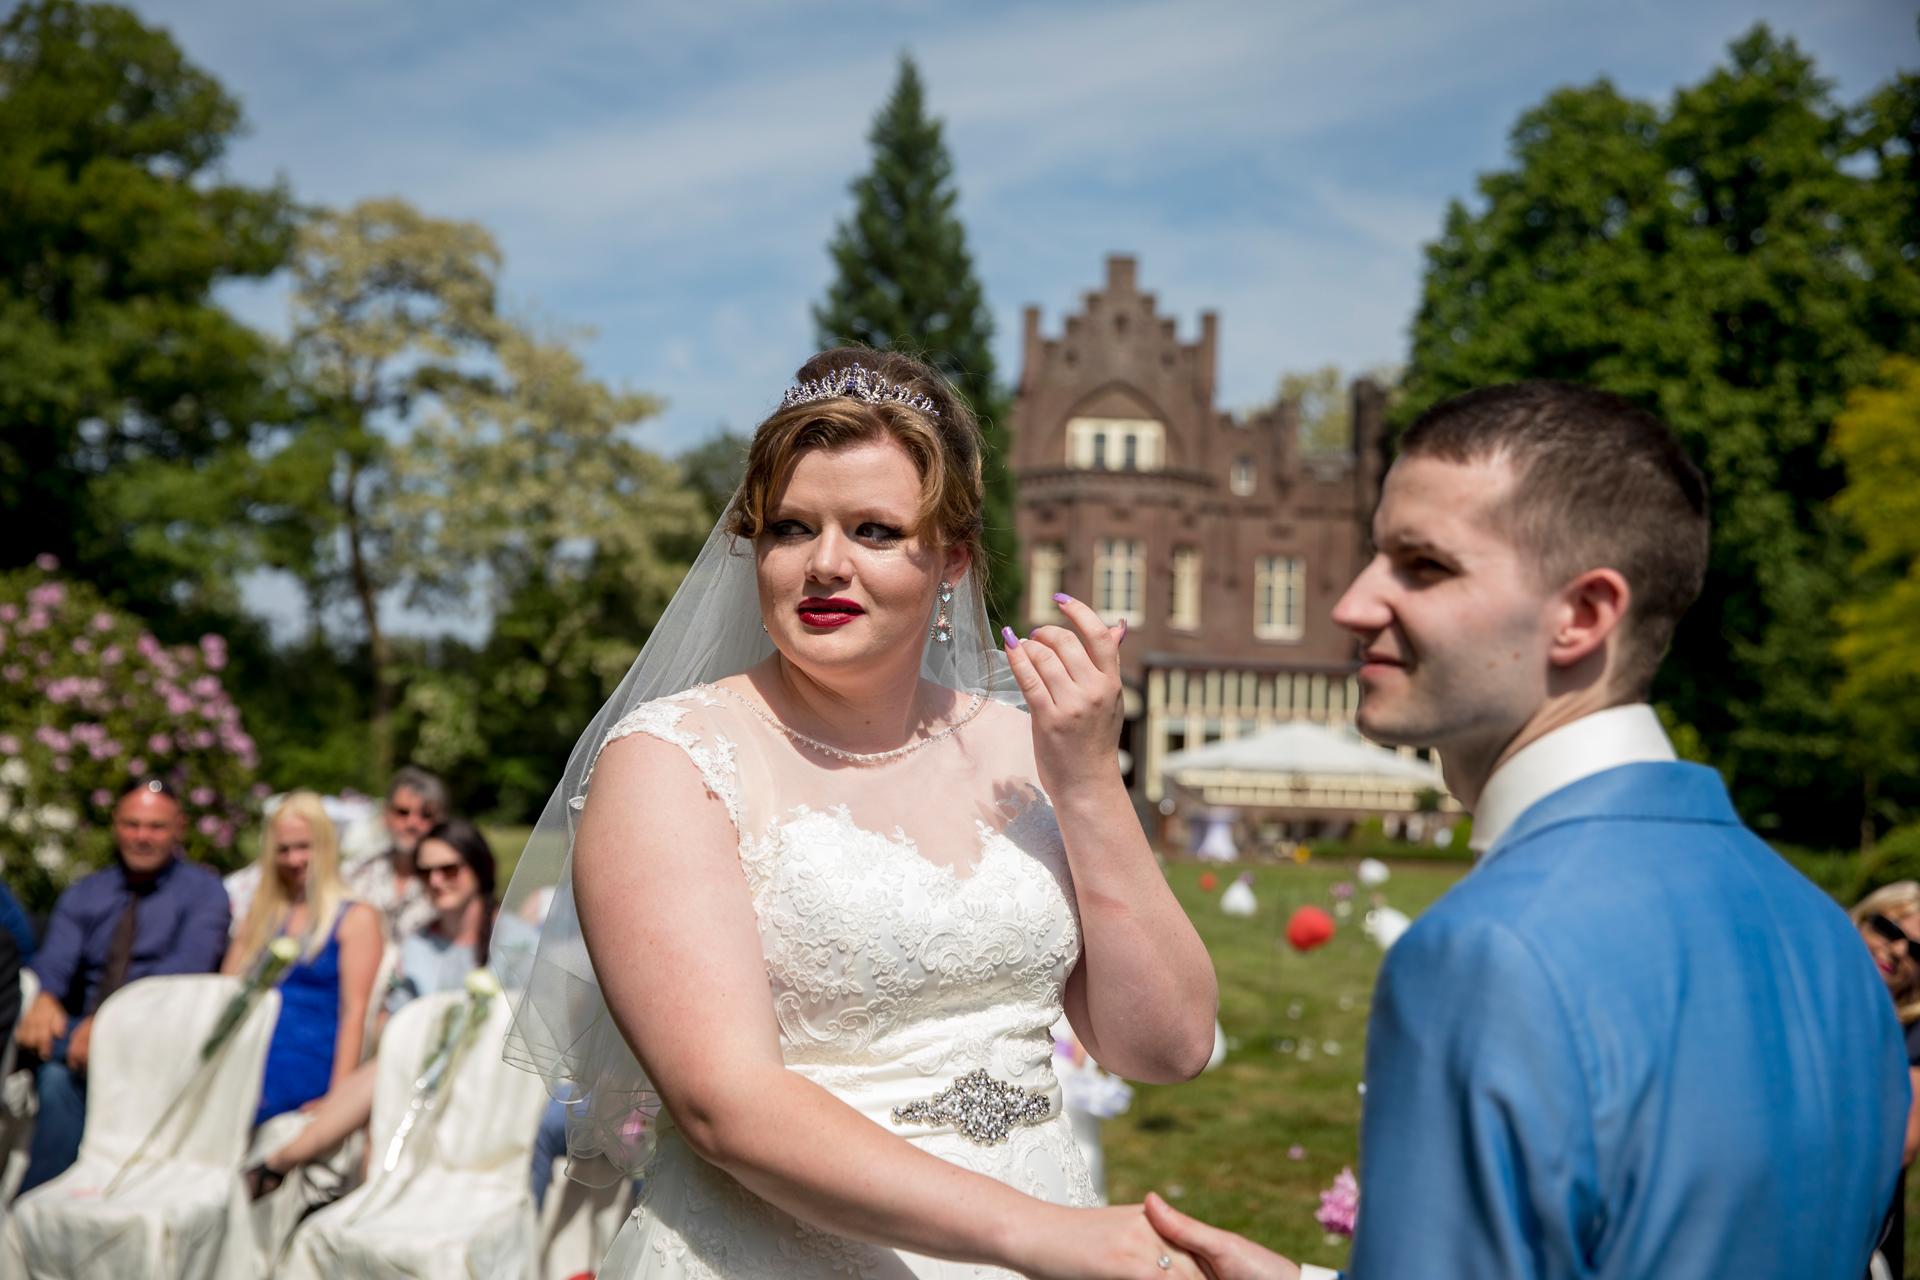 peggylaugsfotografie-bruid-trouwen-bruiloft-trouwfotograaf